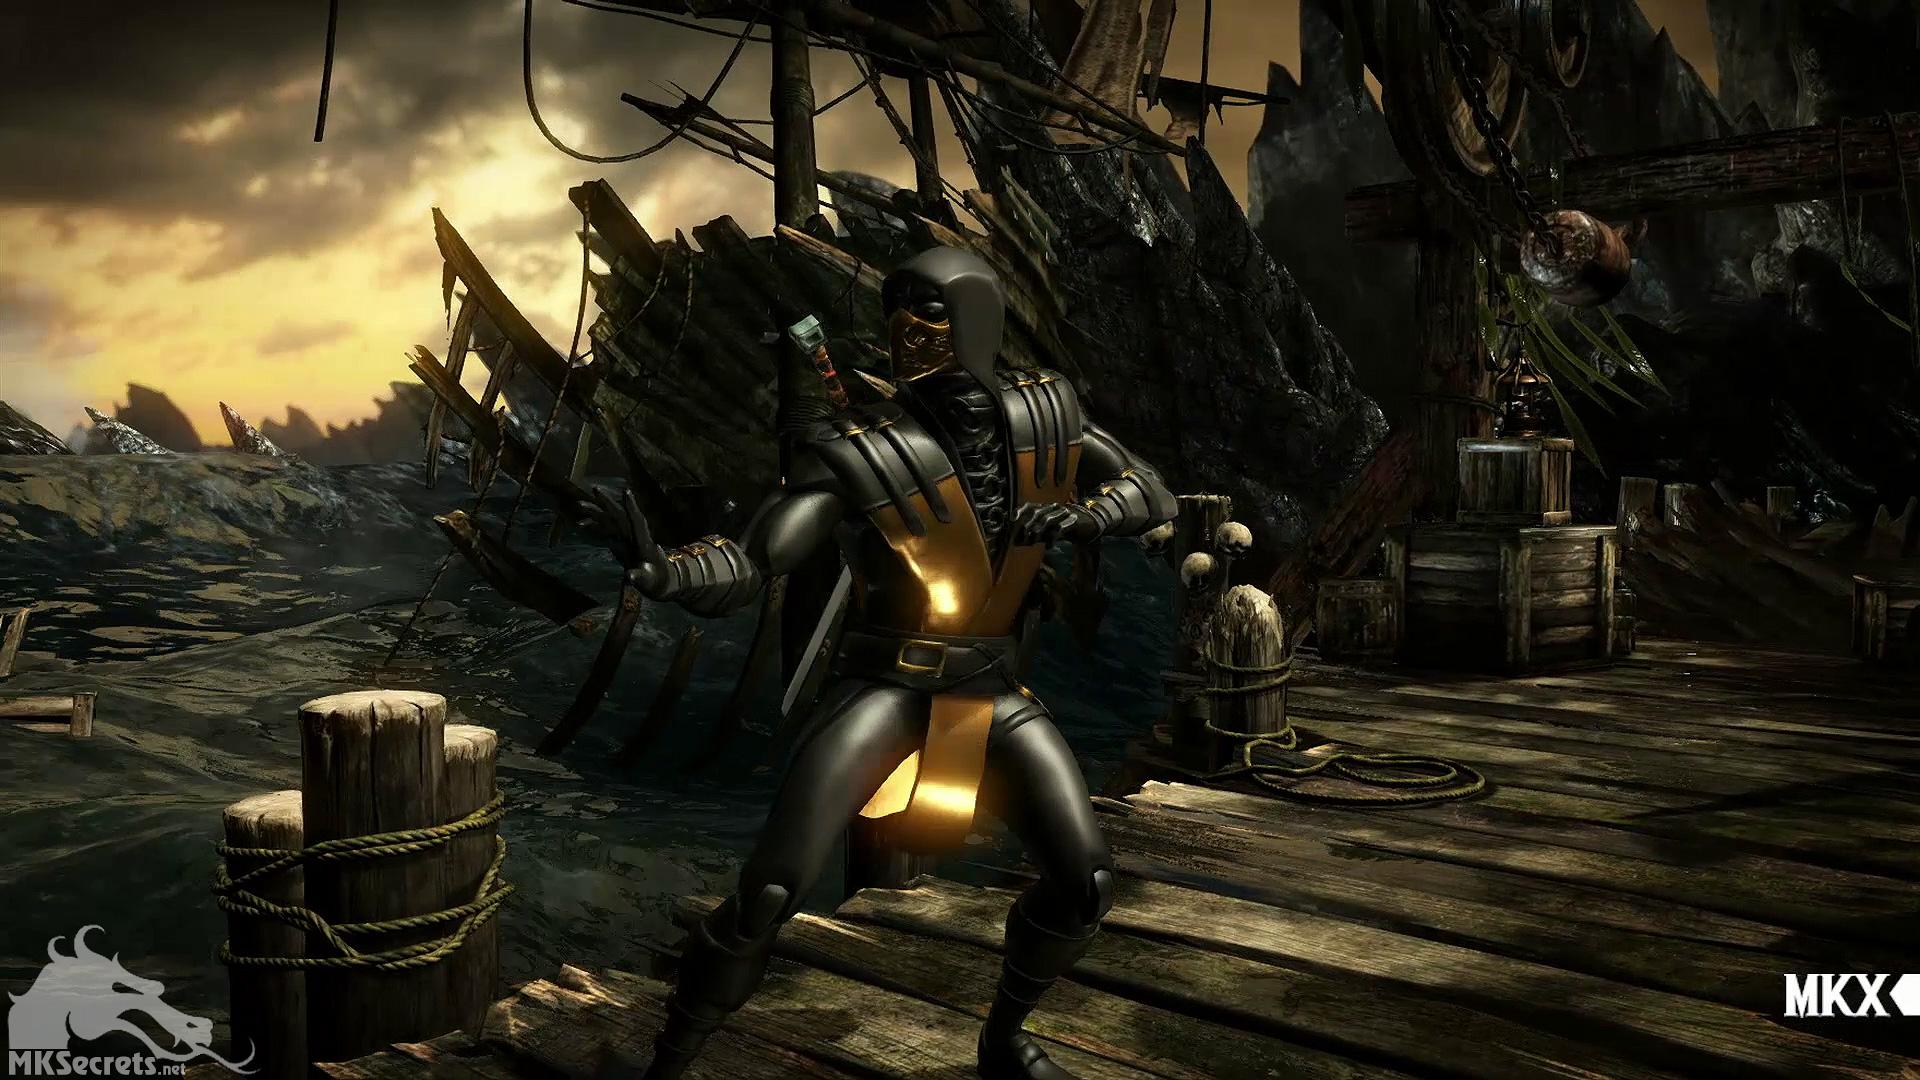 Gold Scorpion Mortal Kombat X for Pinterest 1920x1080